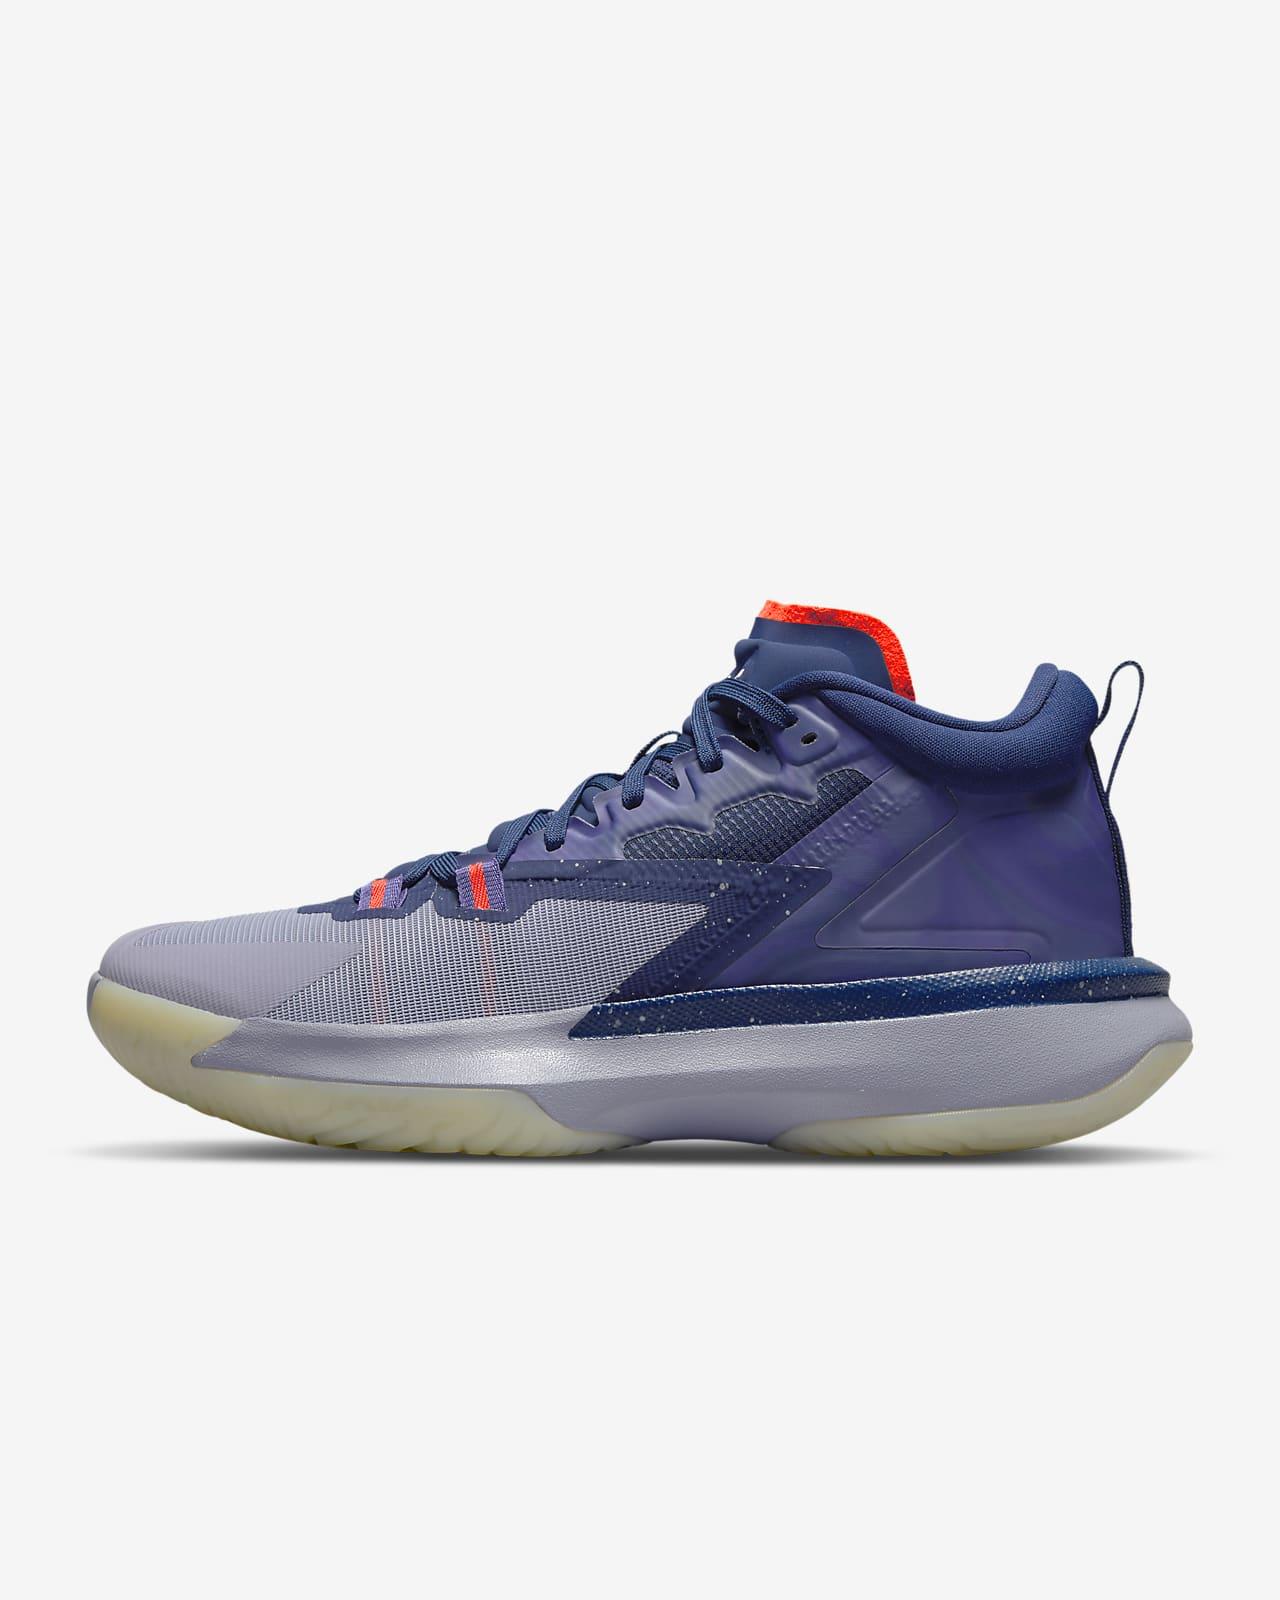 Zion 1 Basketballschuh